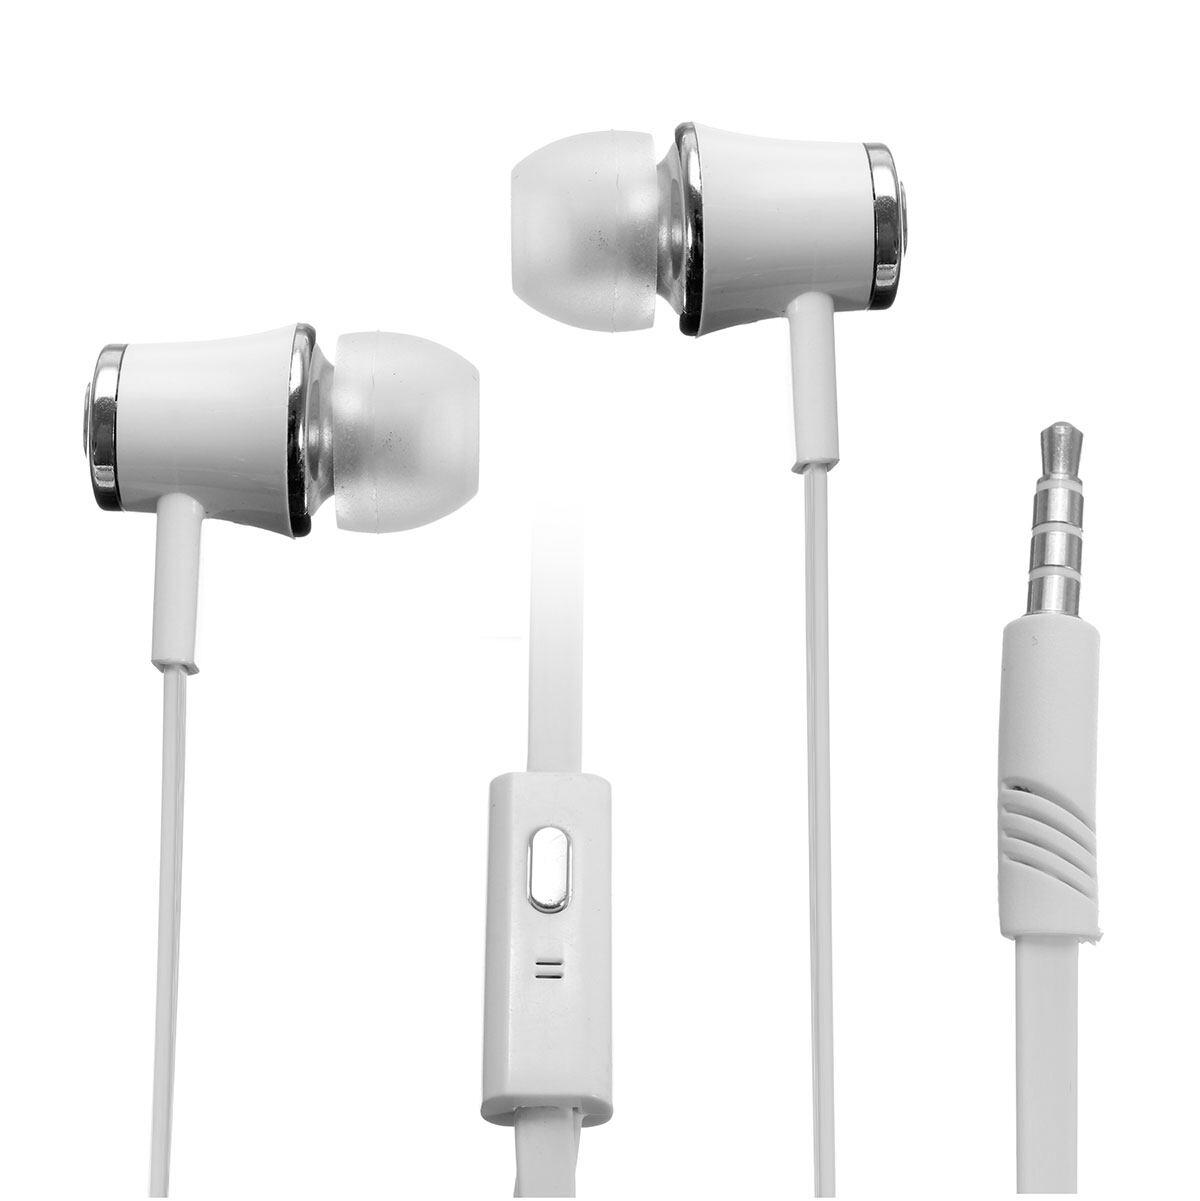 Langston Langsdom JM21 3.5 Mm In-Ear Earphone Stereo Headphone dengan Mikrofon-Intl